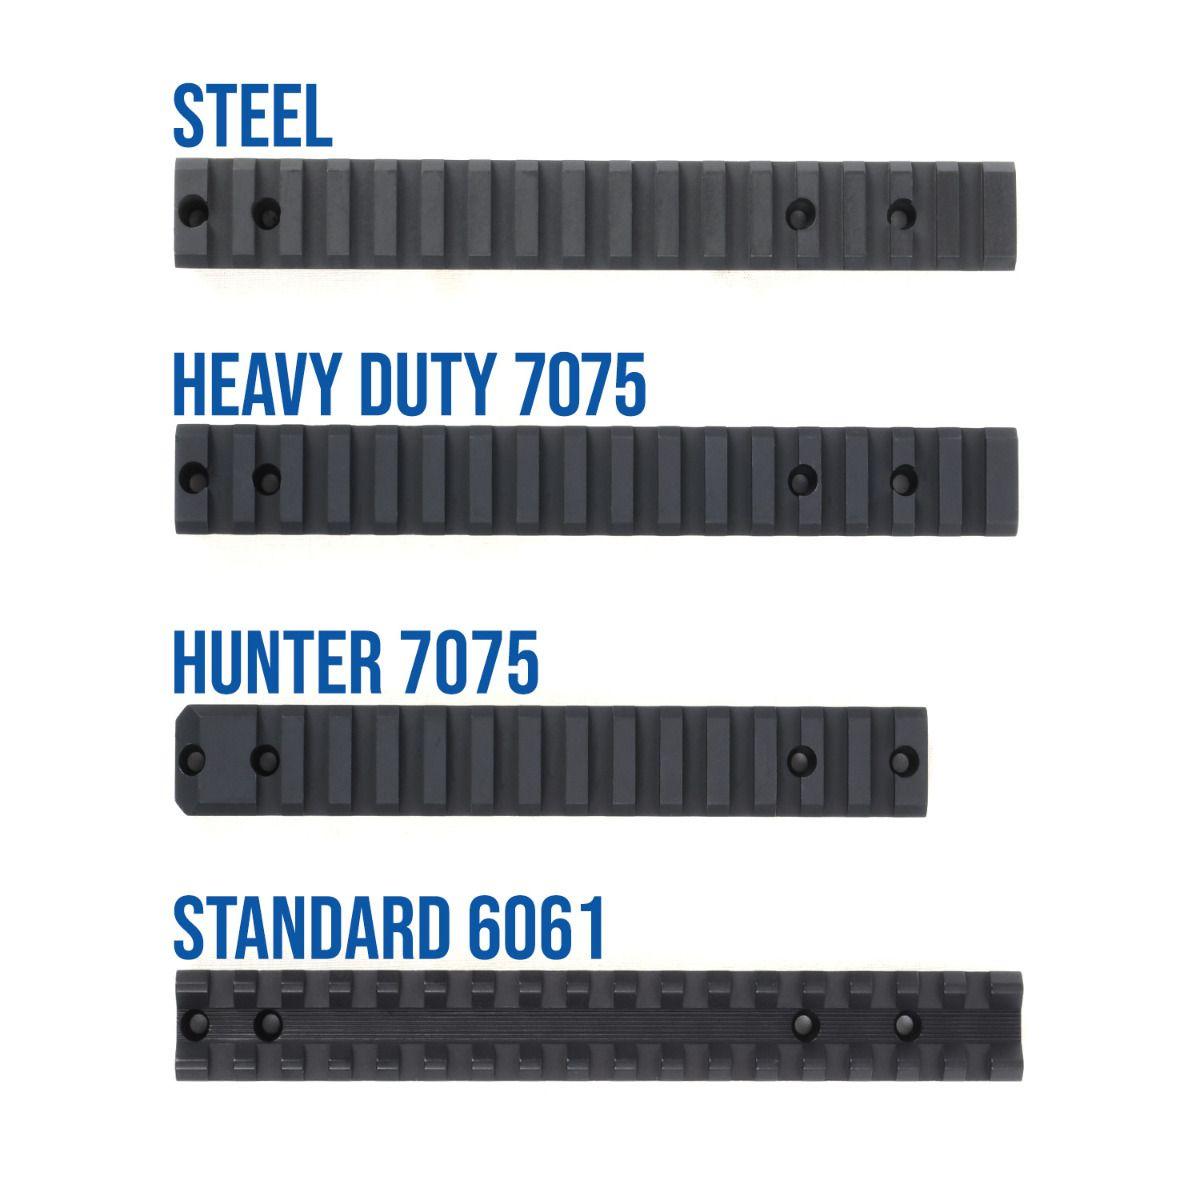 Hunter Series Savage Axis Picatinny Rail 0 MOA